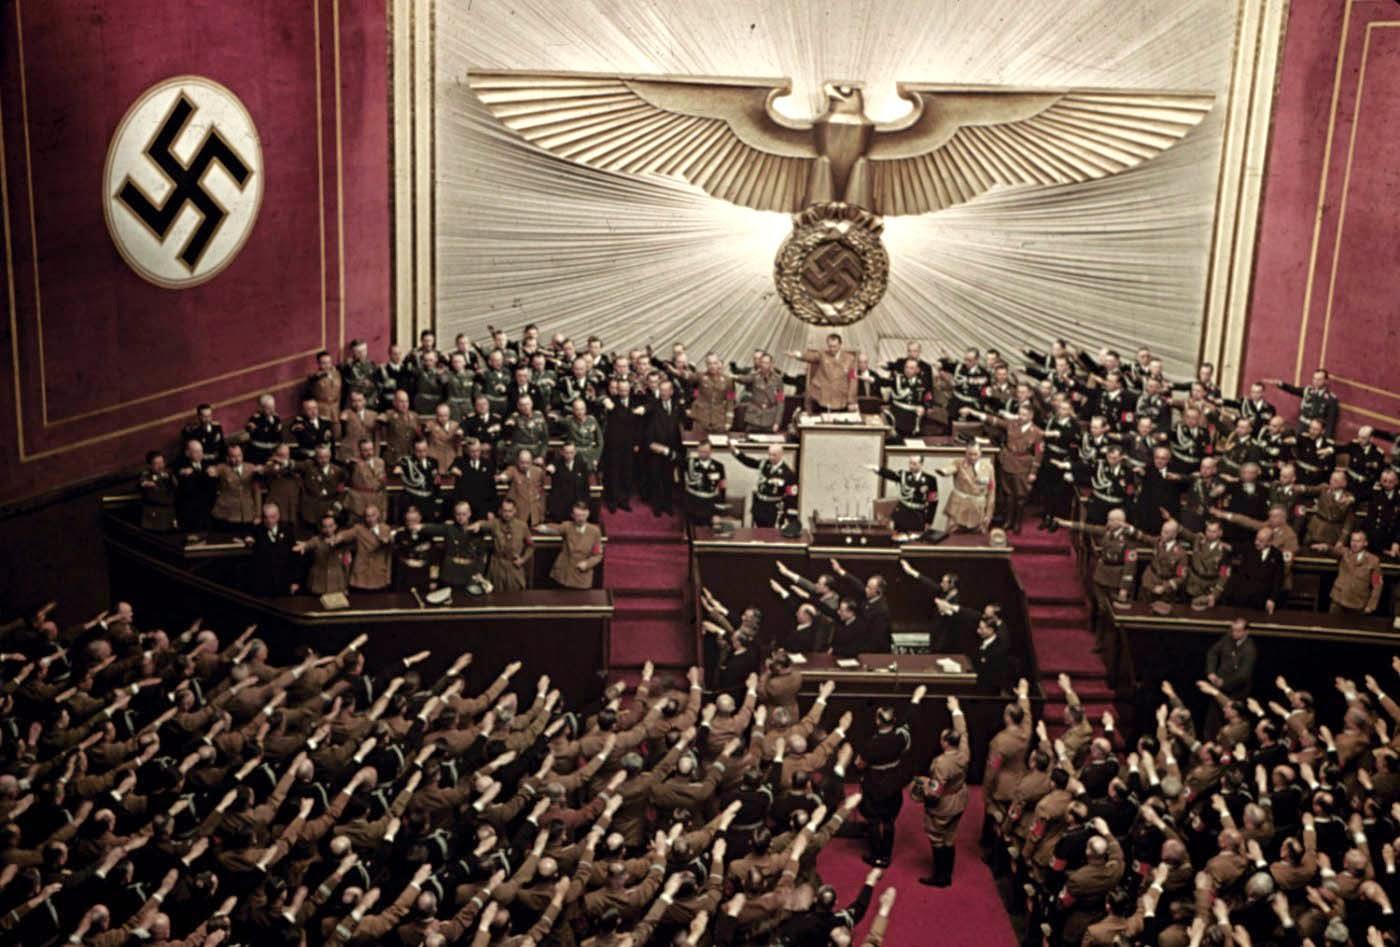 Adolf Hitler makes keynote address at Reichstag session, Kroll Opera House, Berlin, 1939. (Image: RareHistoricalPhotos)